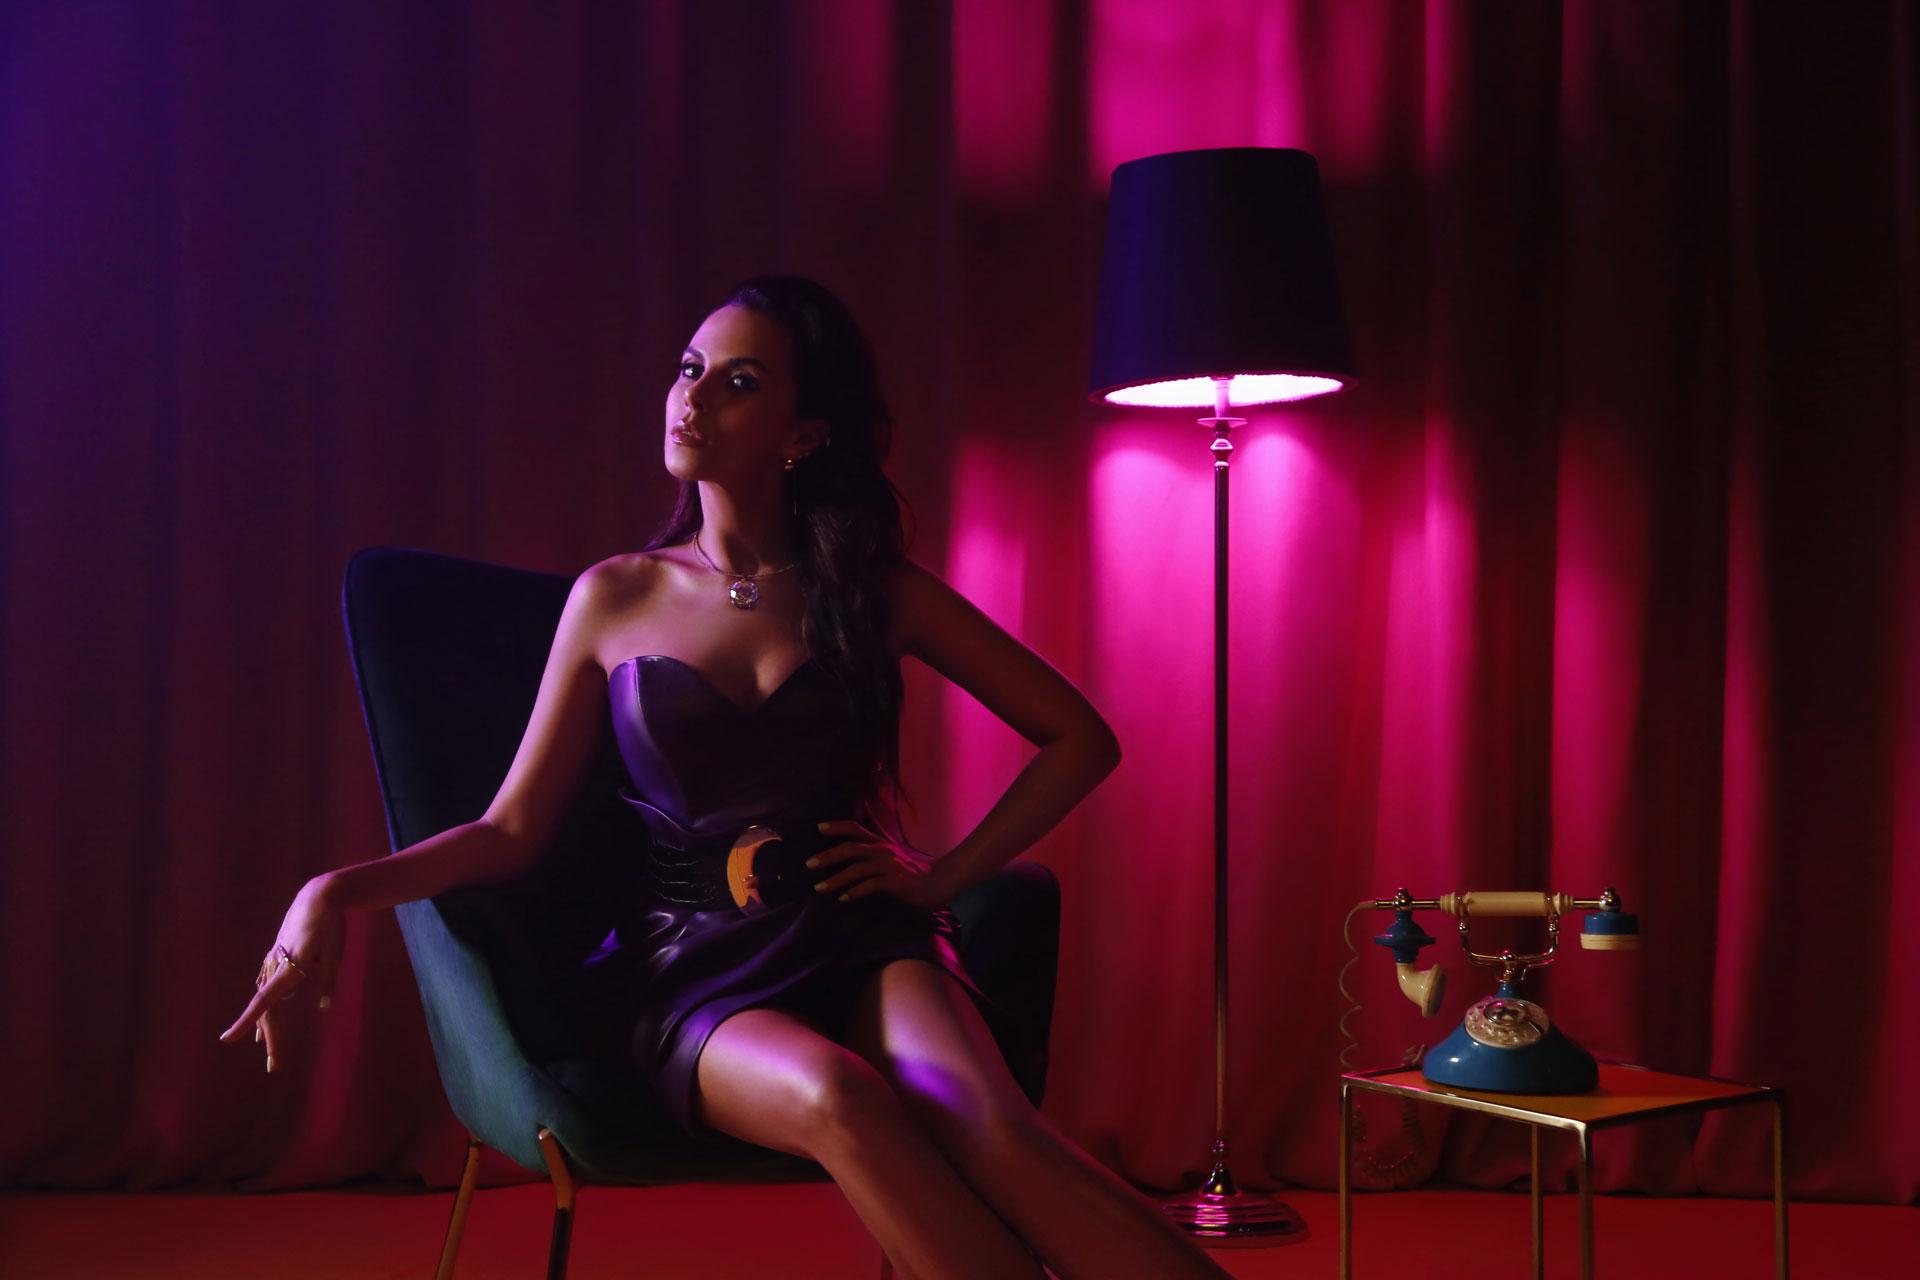 Music Video Lollipop